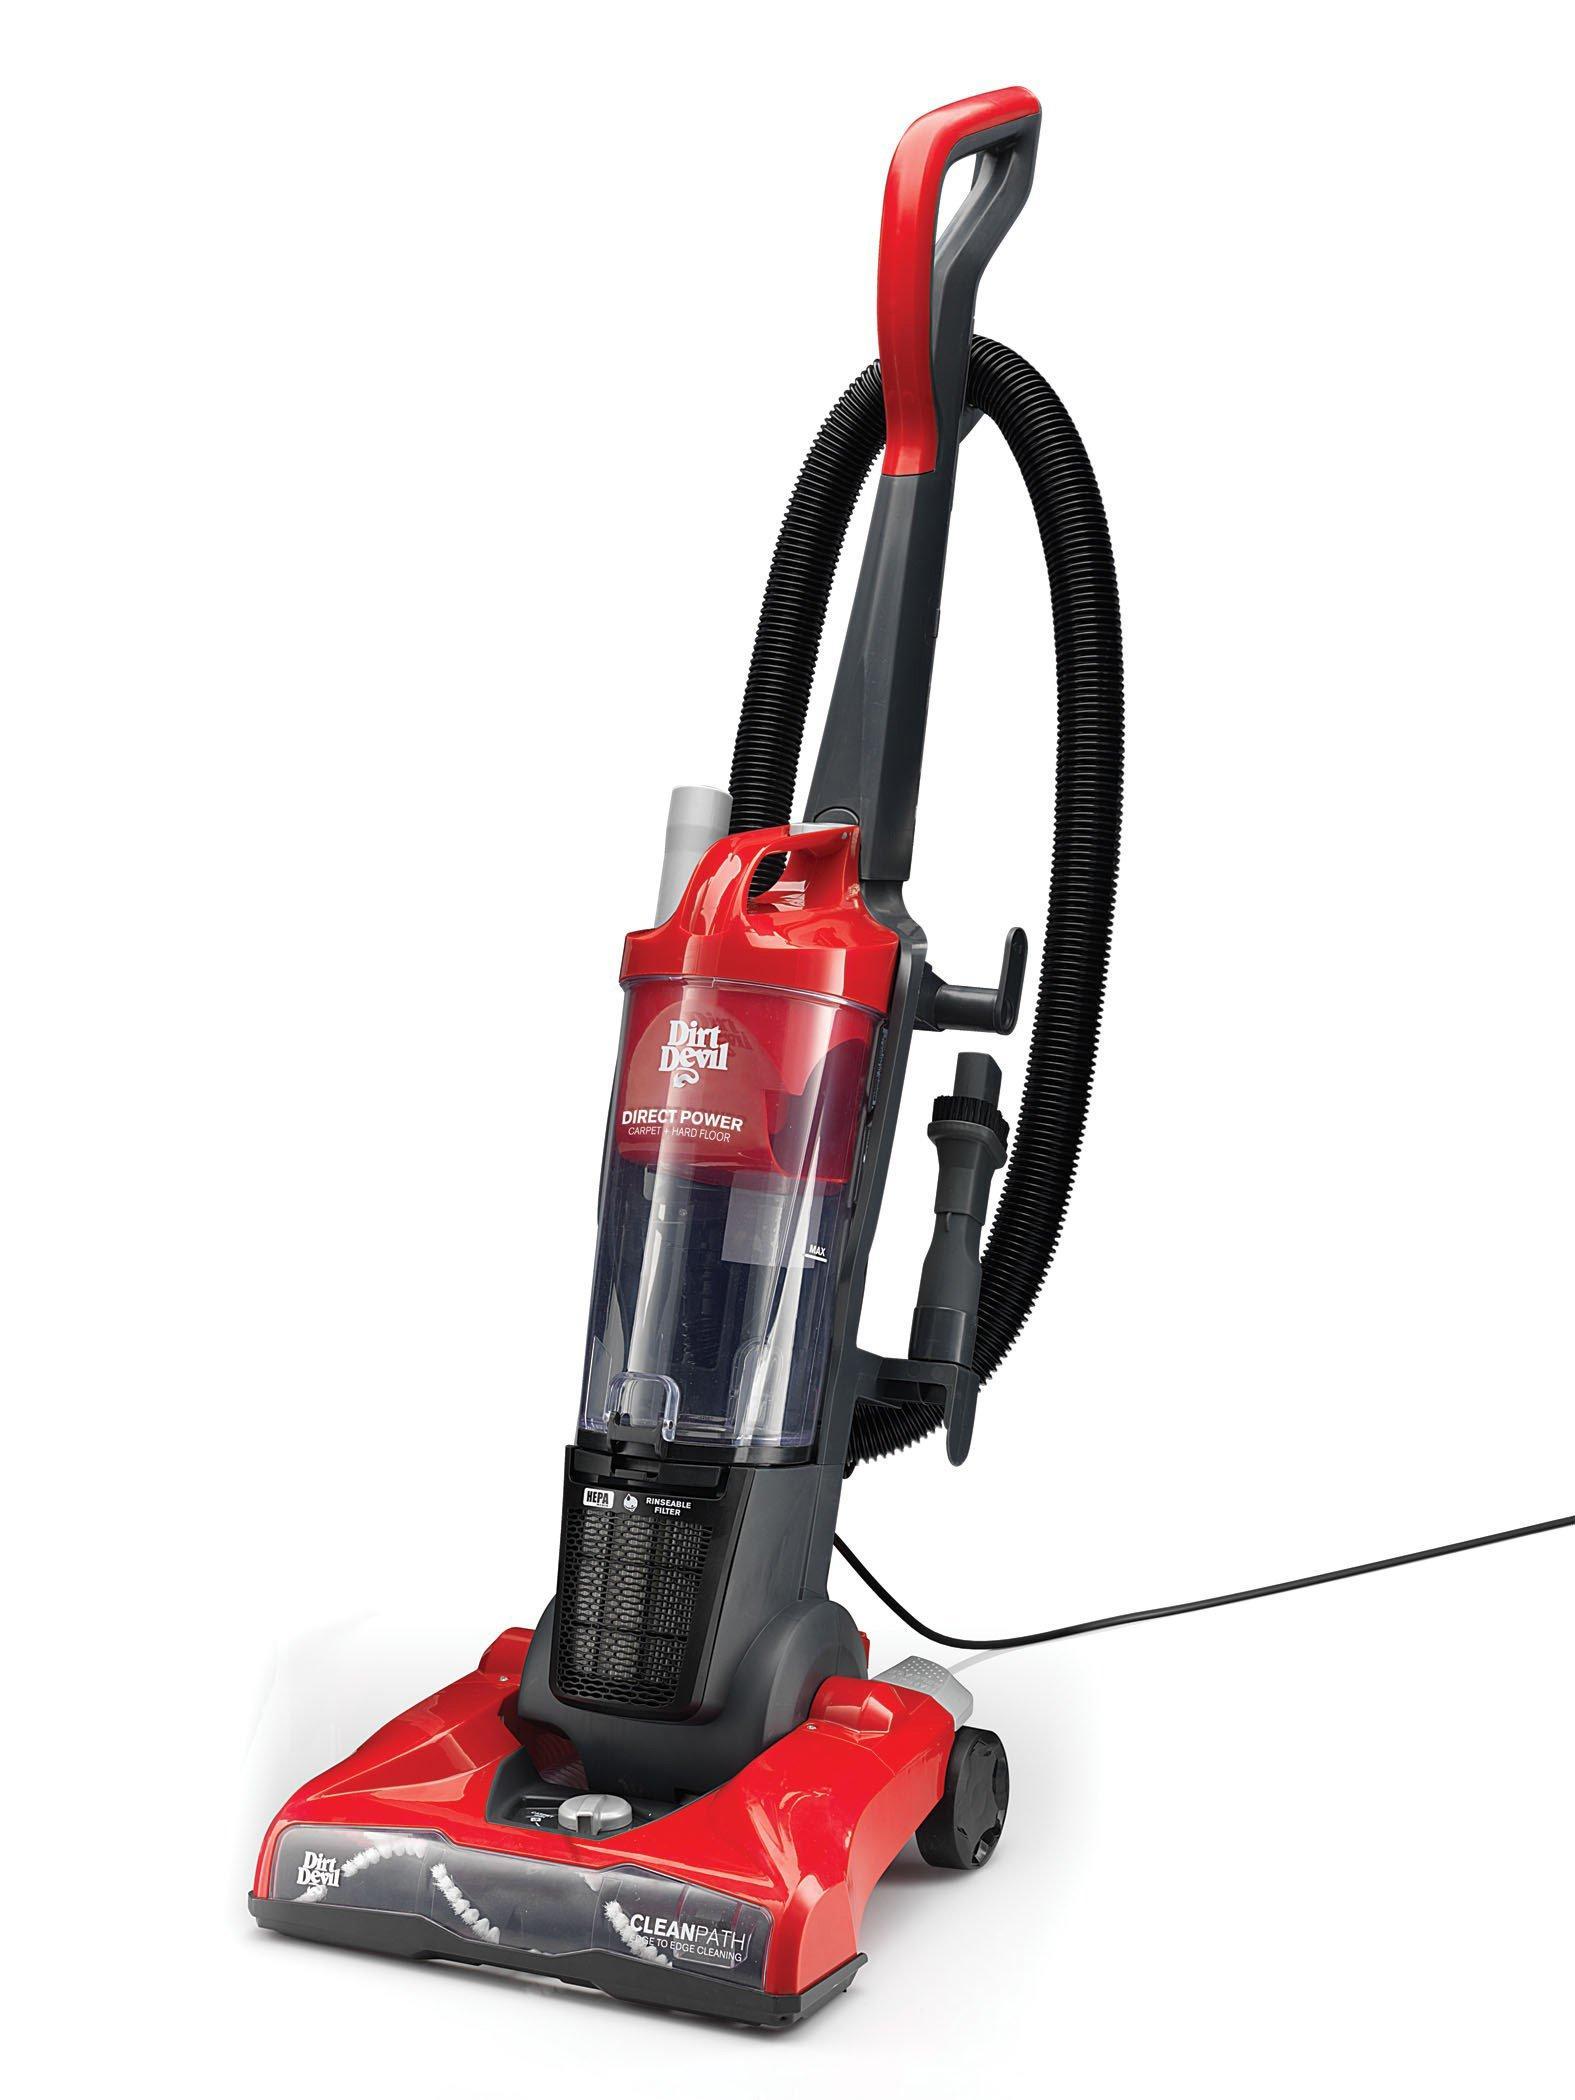 Direct Power Upright Vacuum3